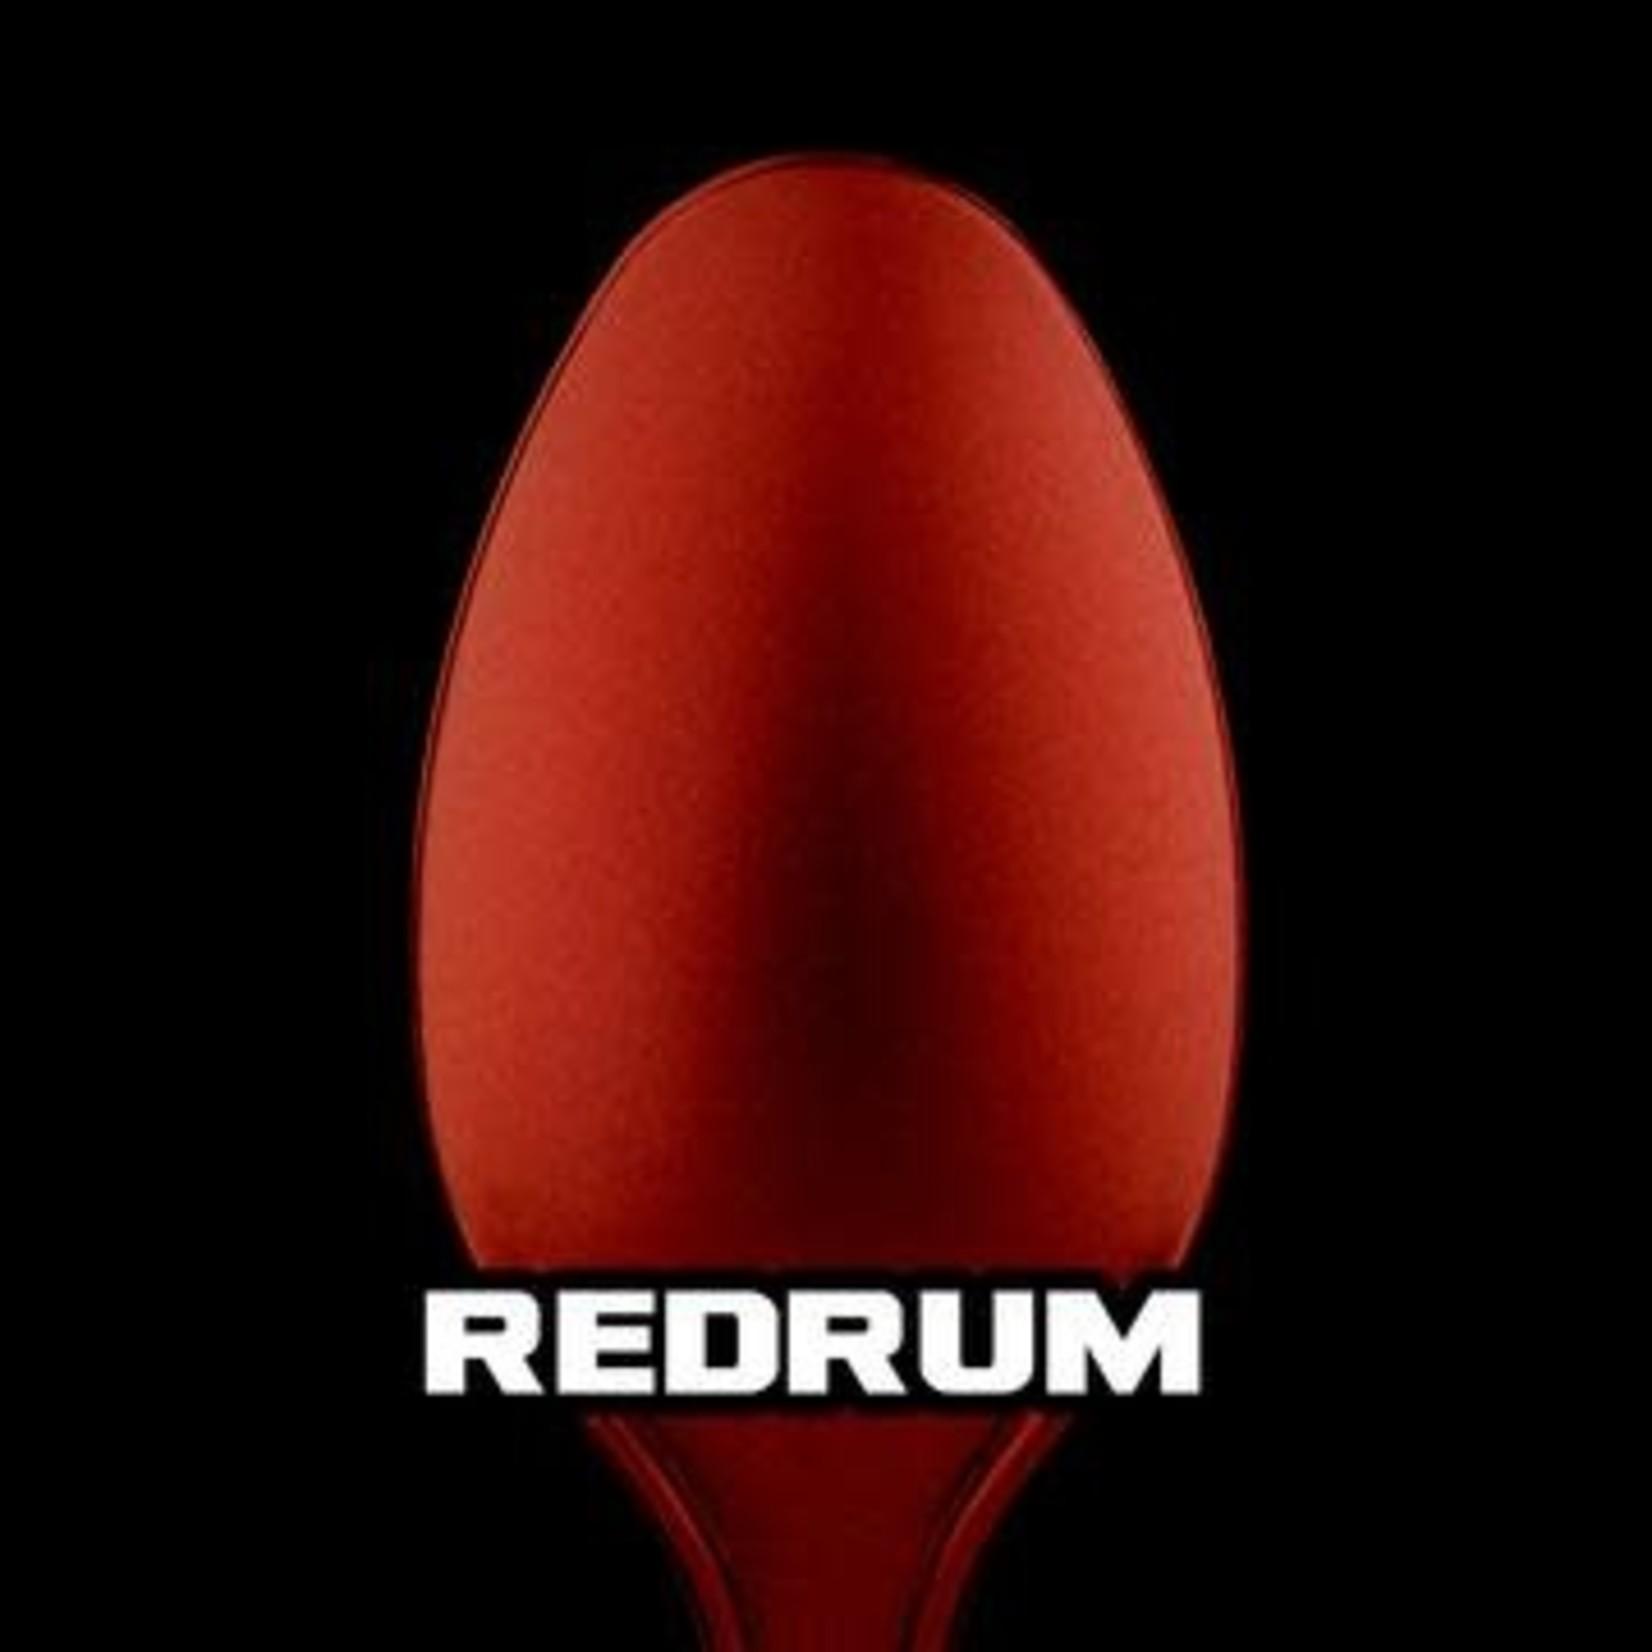 Turbo Dork Turbo Dork Redrum Metallic Acrylic Paint 20ml Bottle